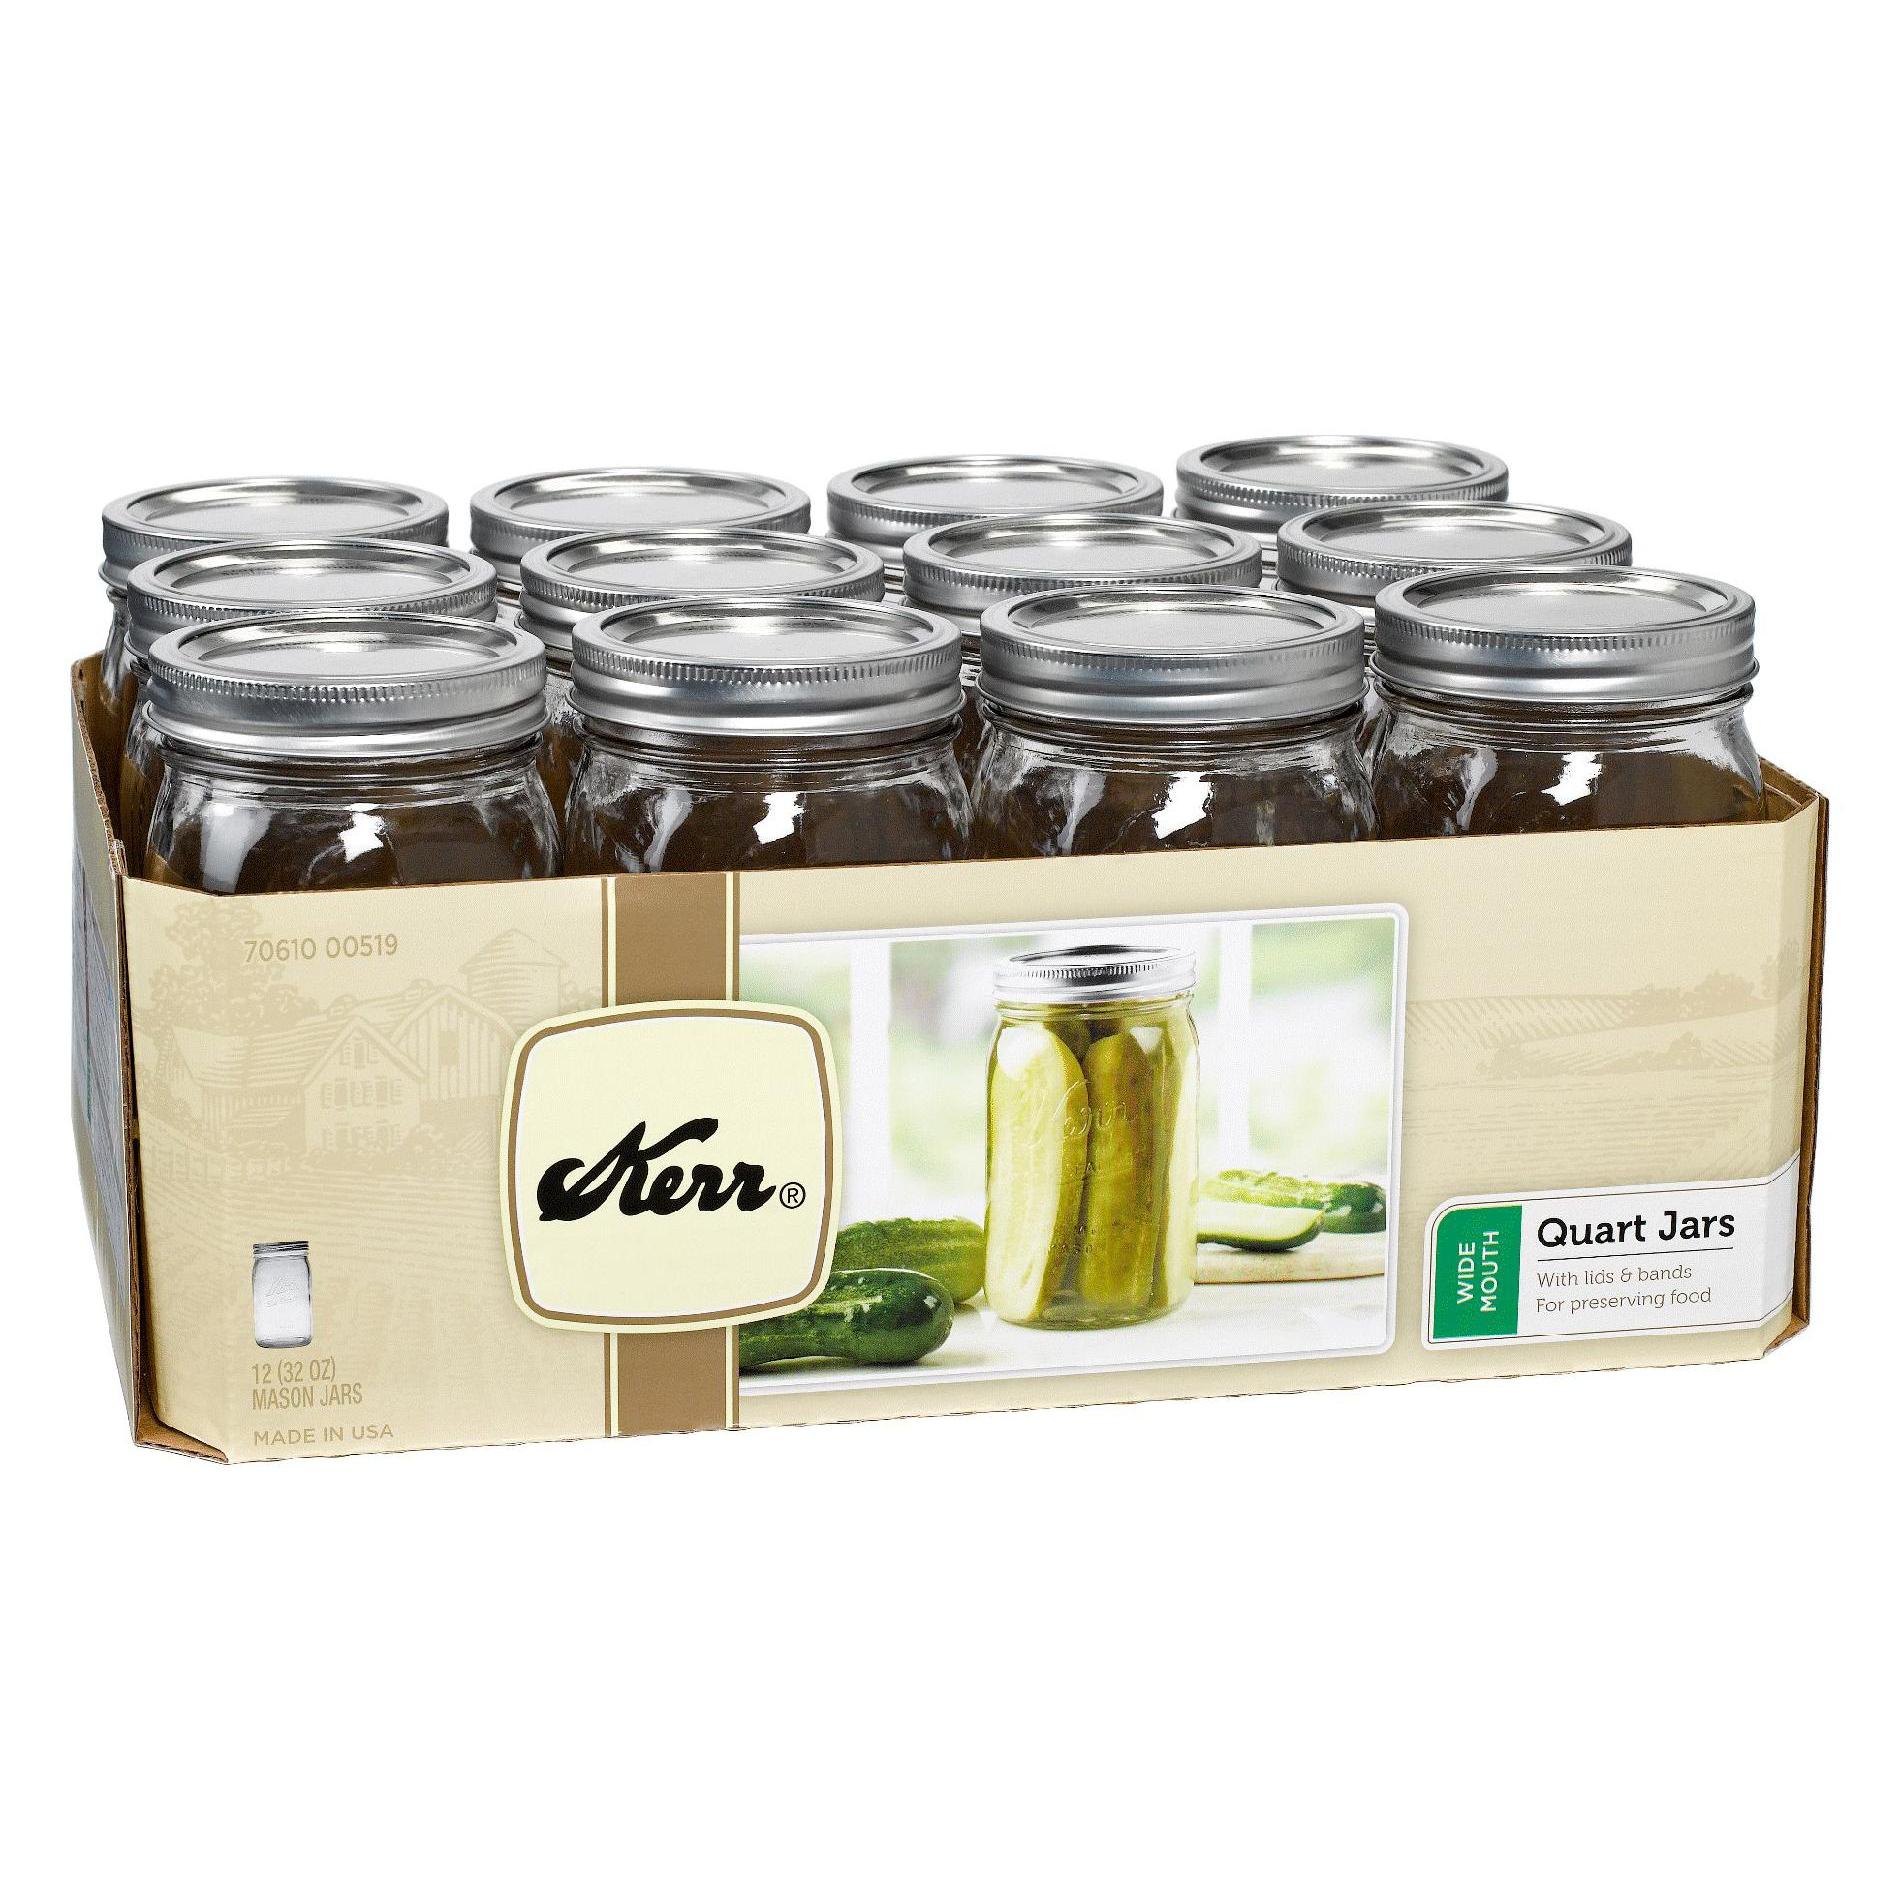 Pint Jar Ounces Canning